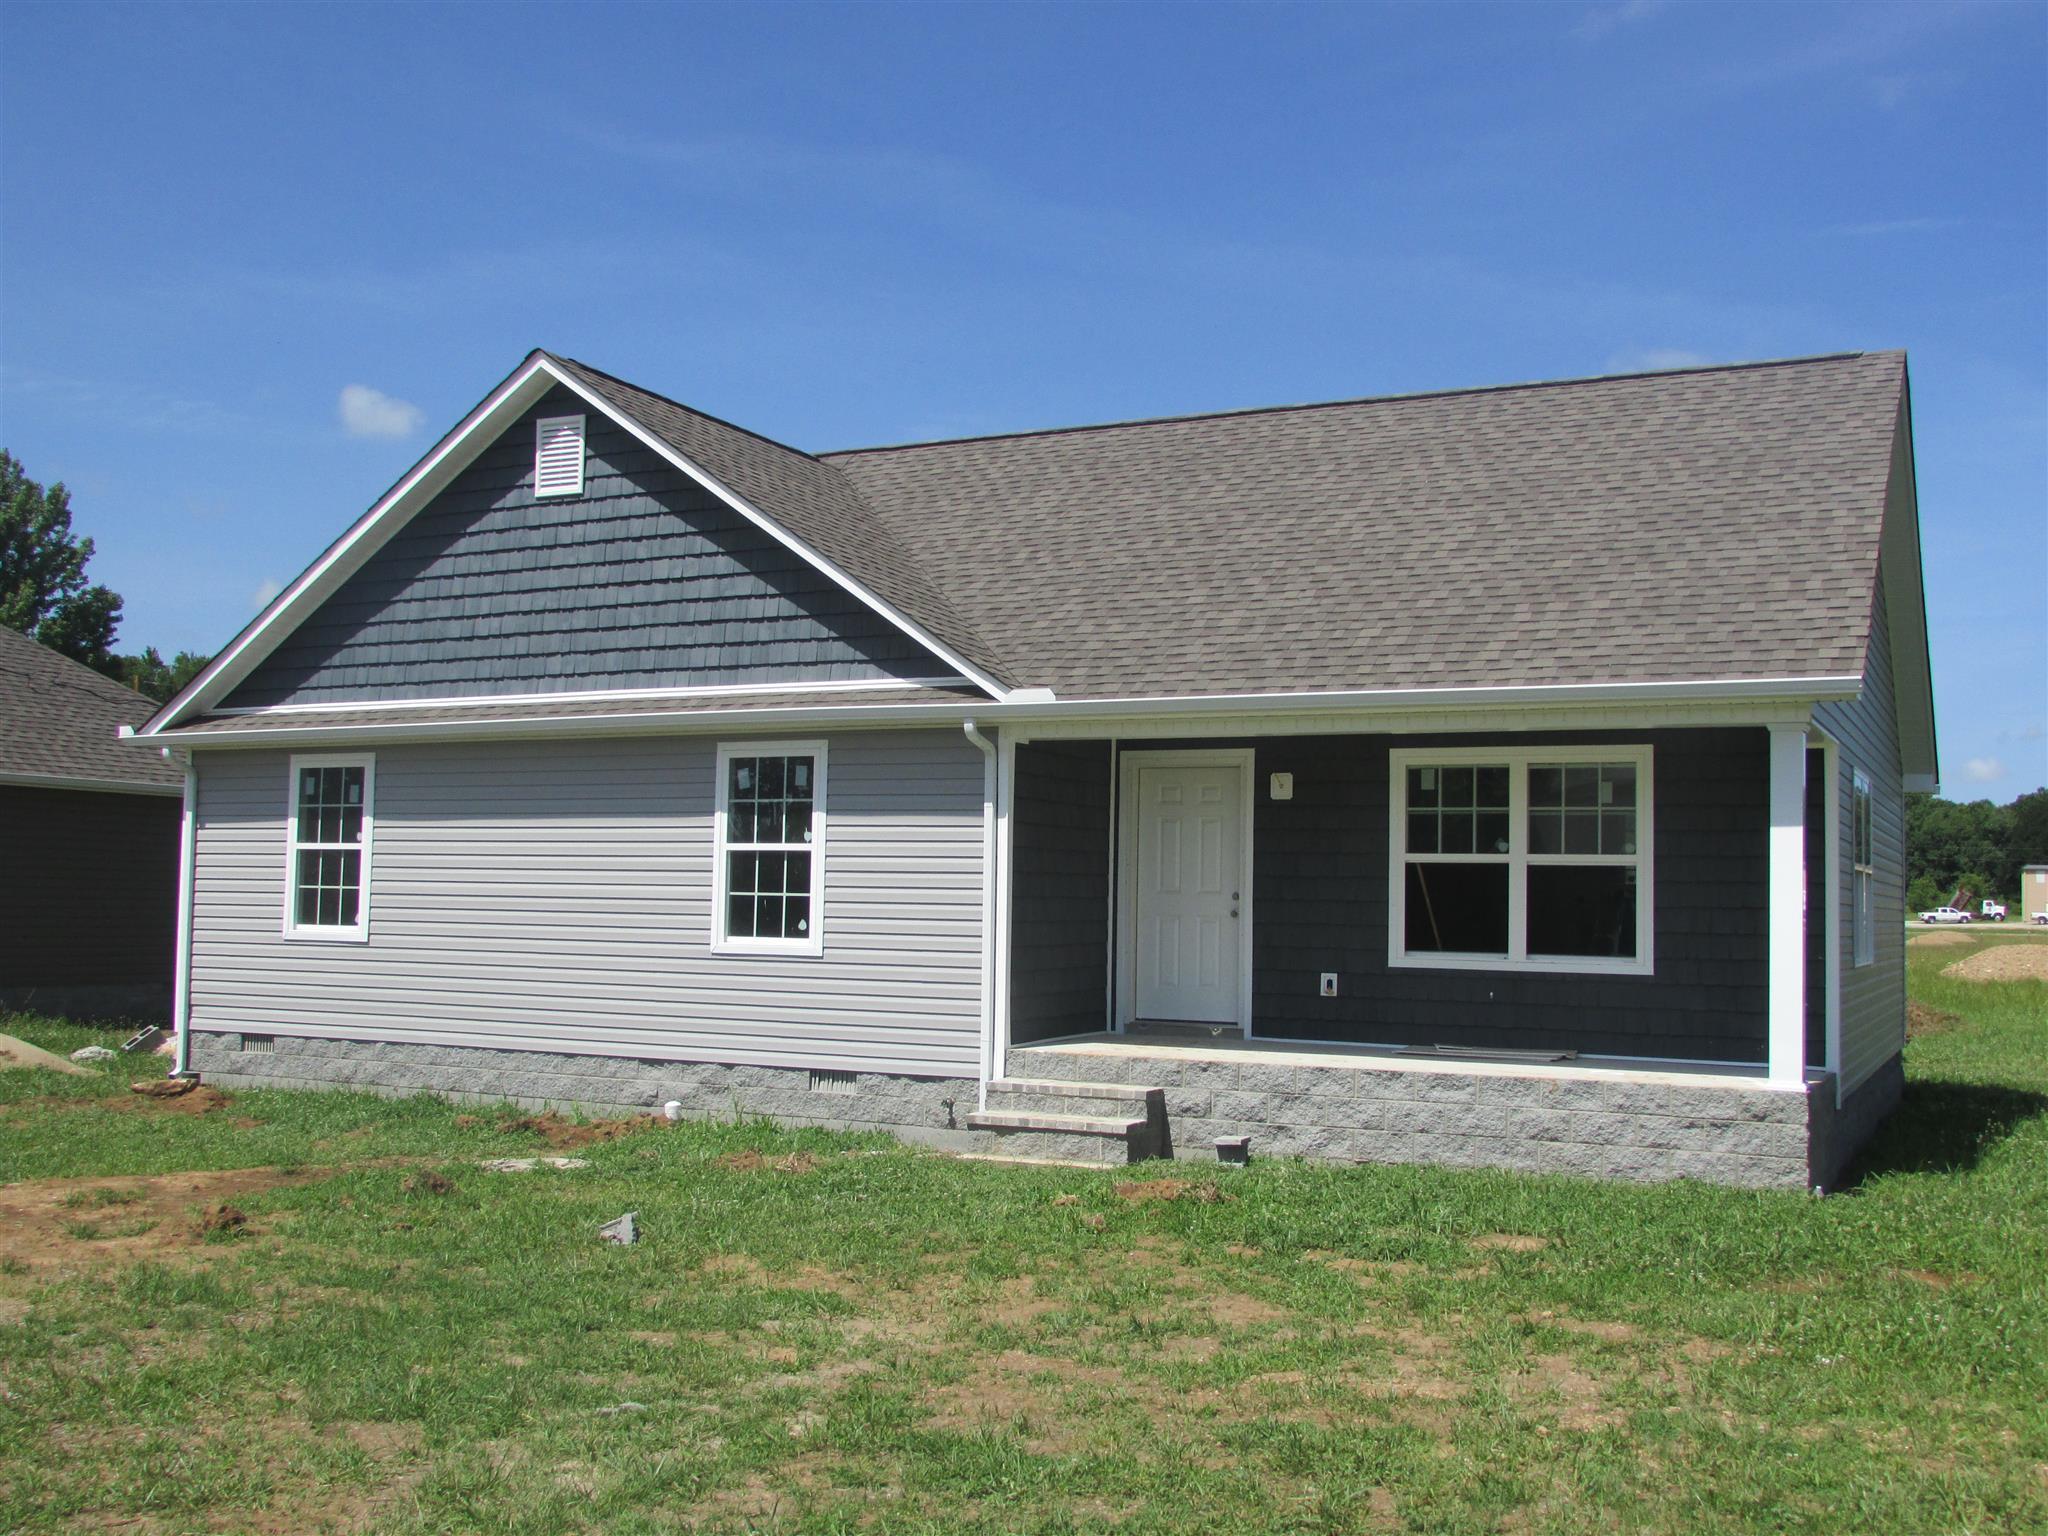 414 Gobble Street, S, Lawrenceburg, TN 38464 - Lawrenceburg, TN real estate listing